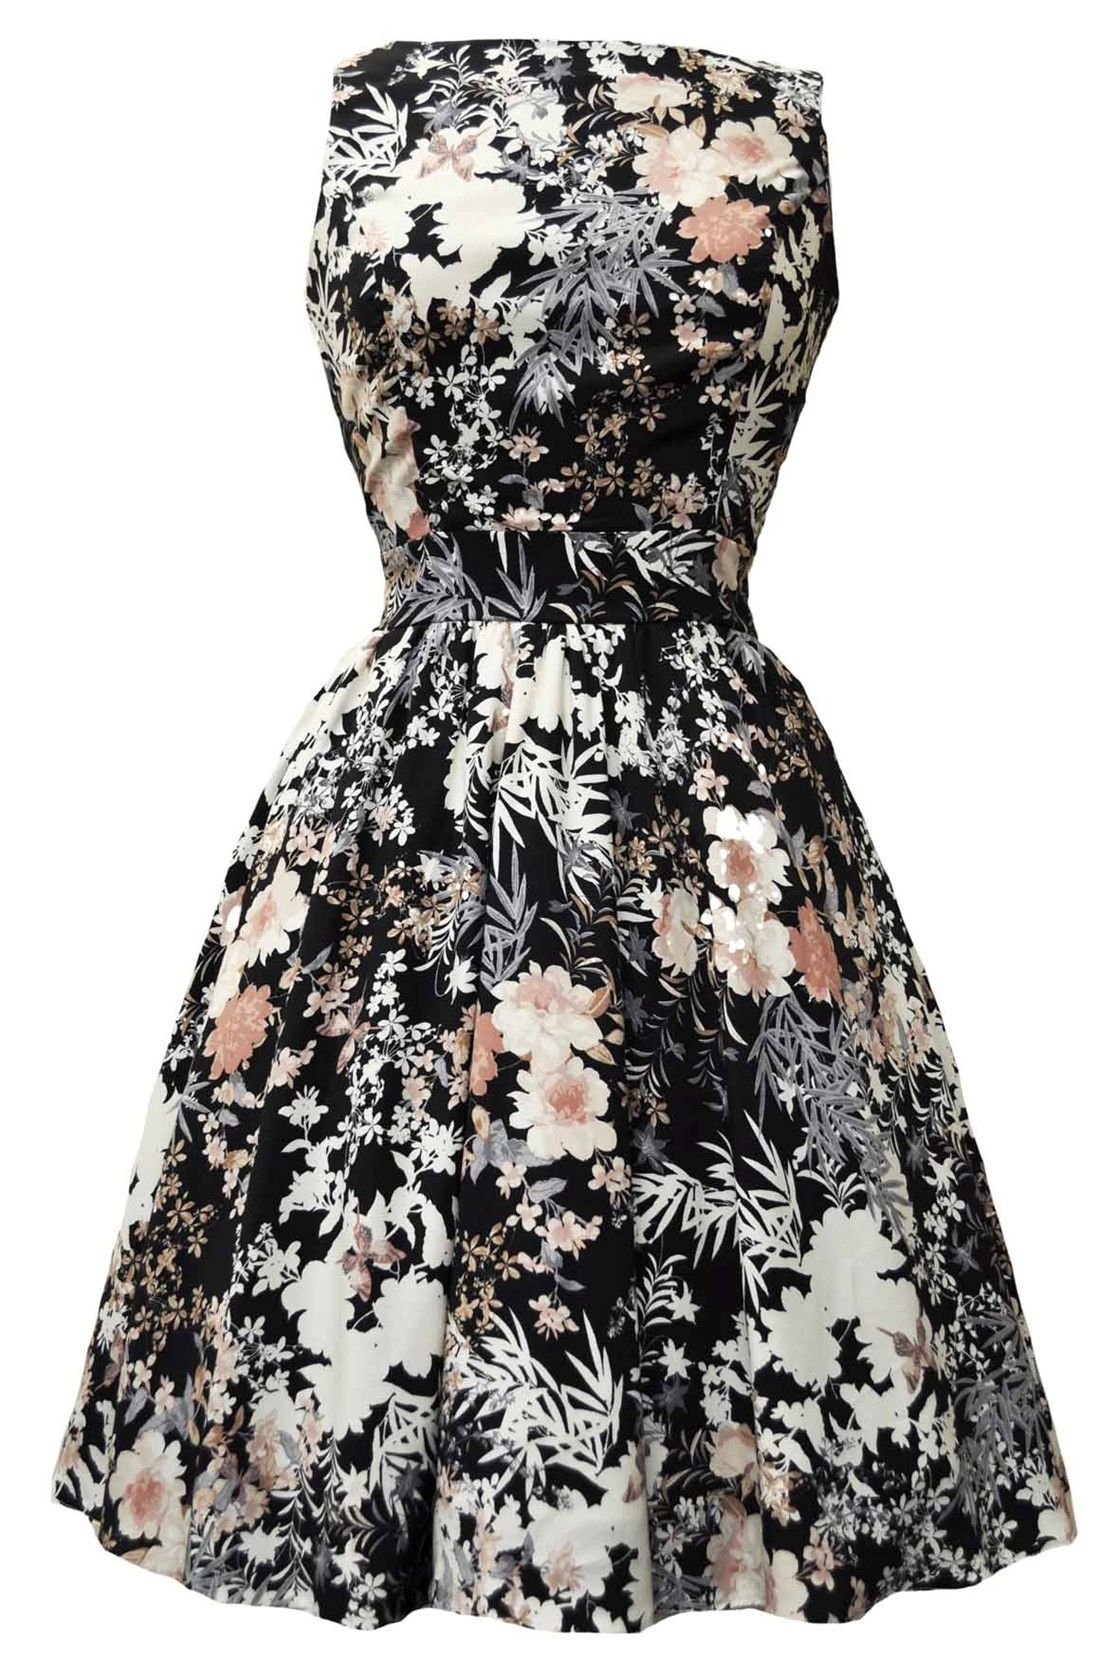 Winter Floral Tea Dress | Kleider | Pinterest | Kleider